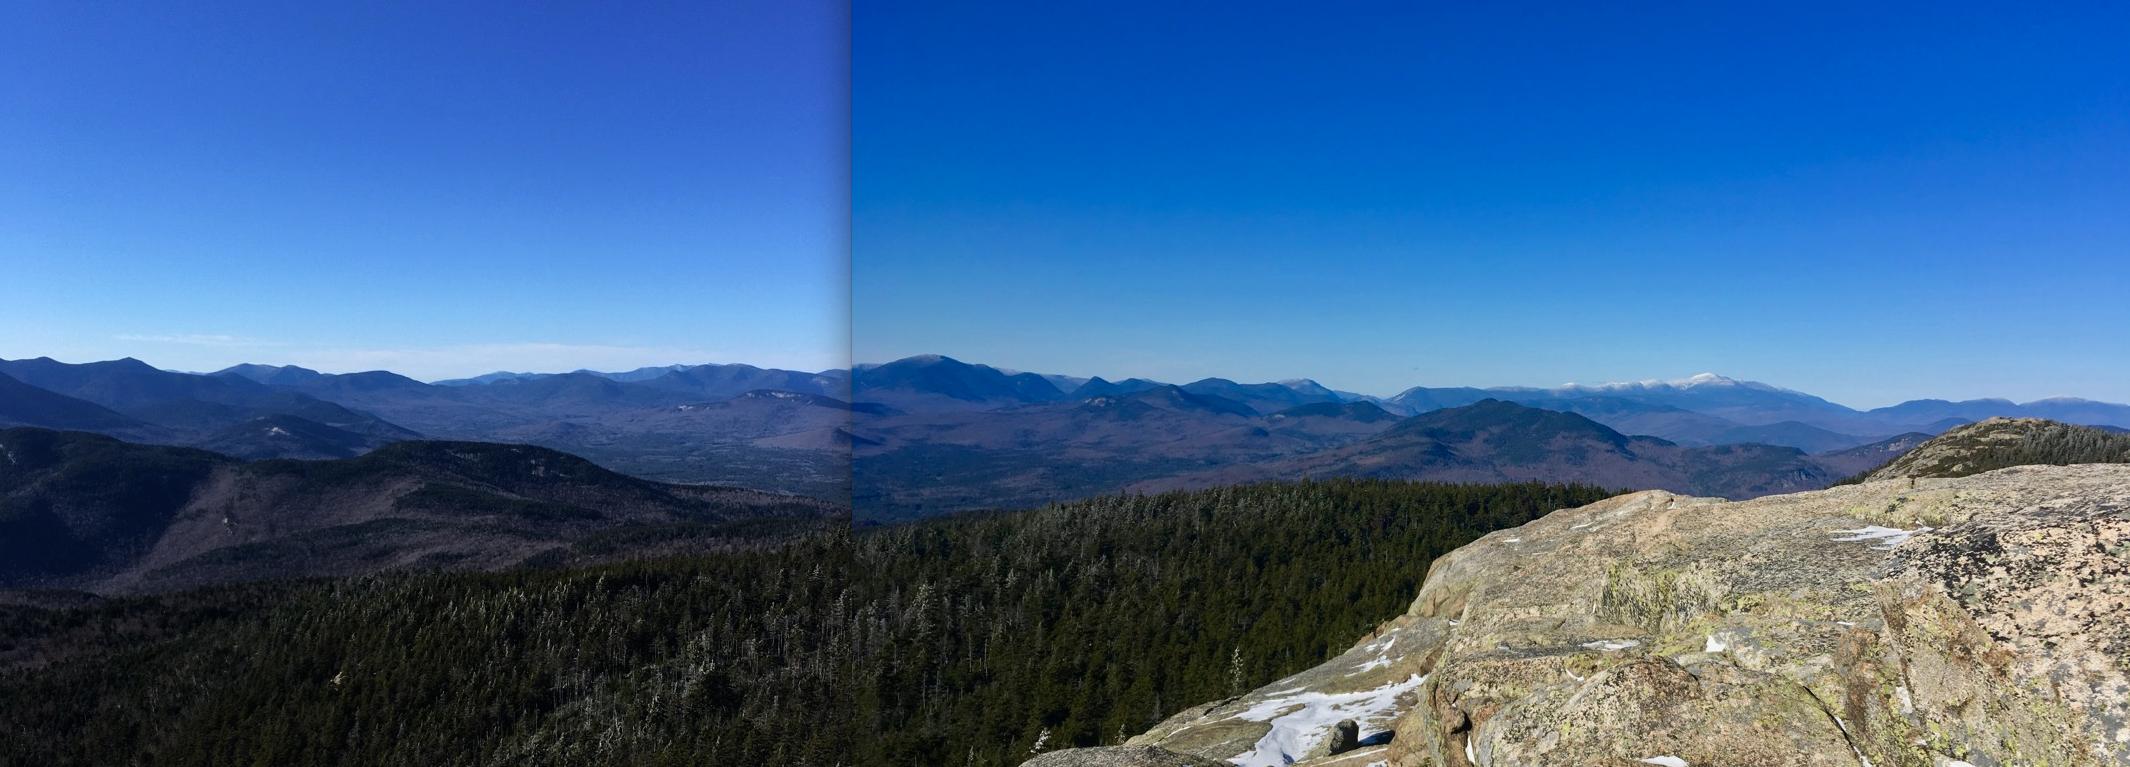 White Mountains Panorama.png